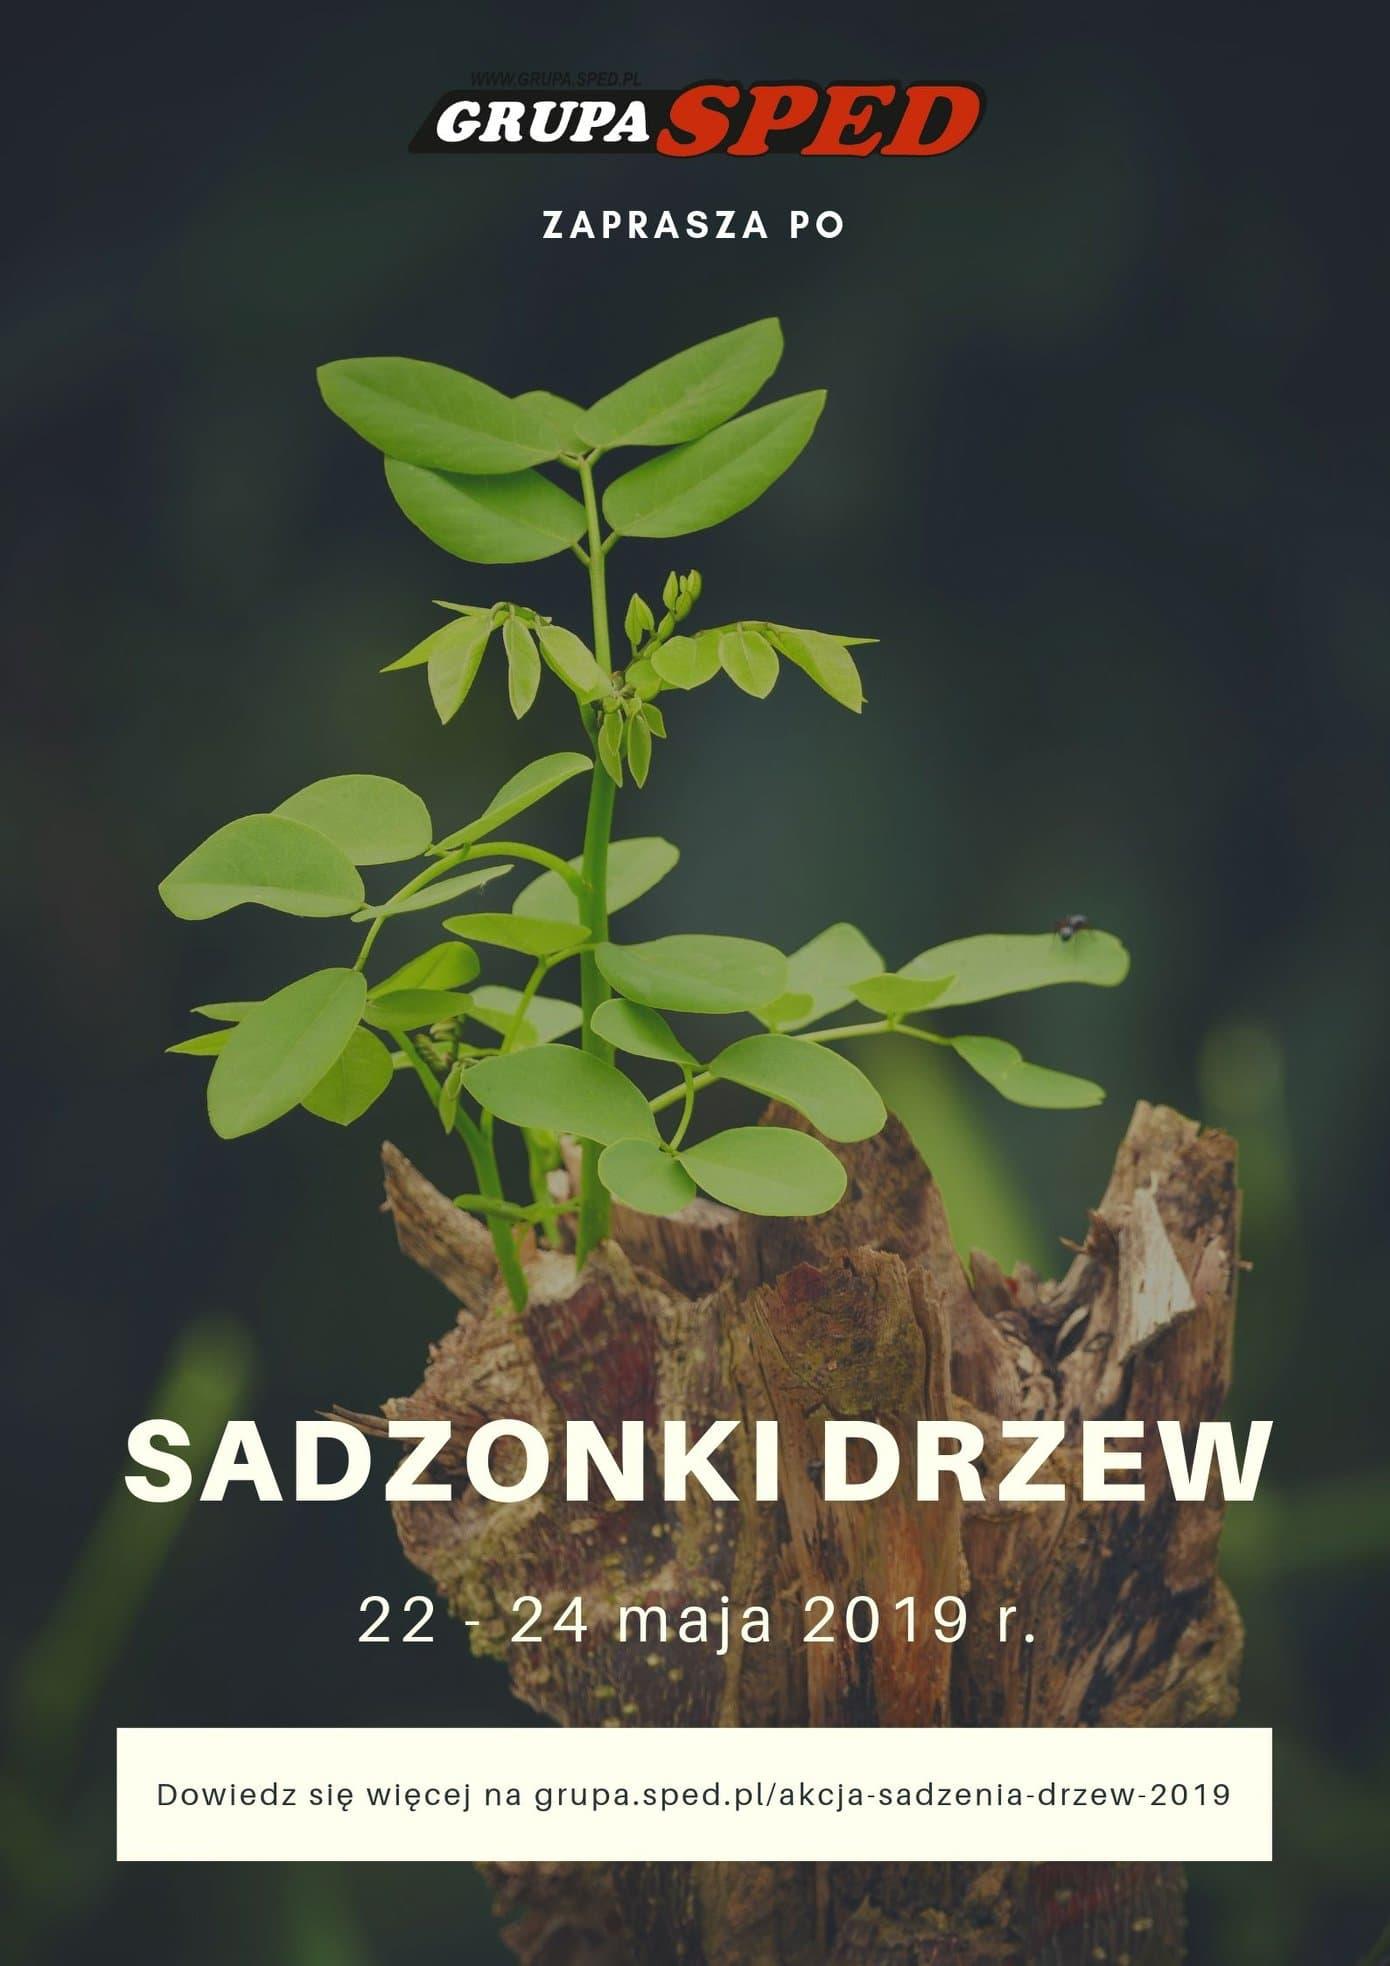 Firma Sped rozdaje sadzonki